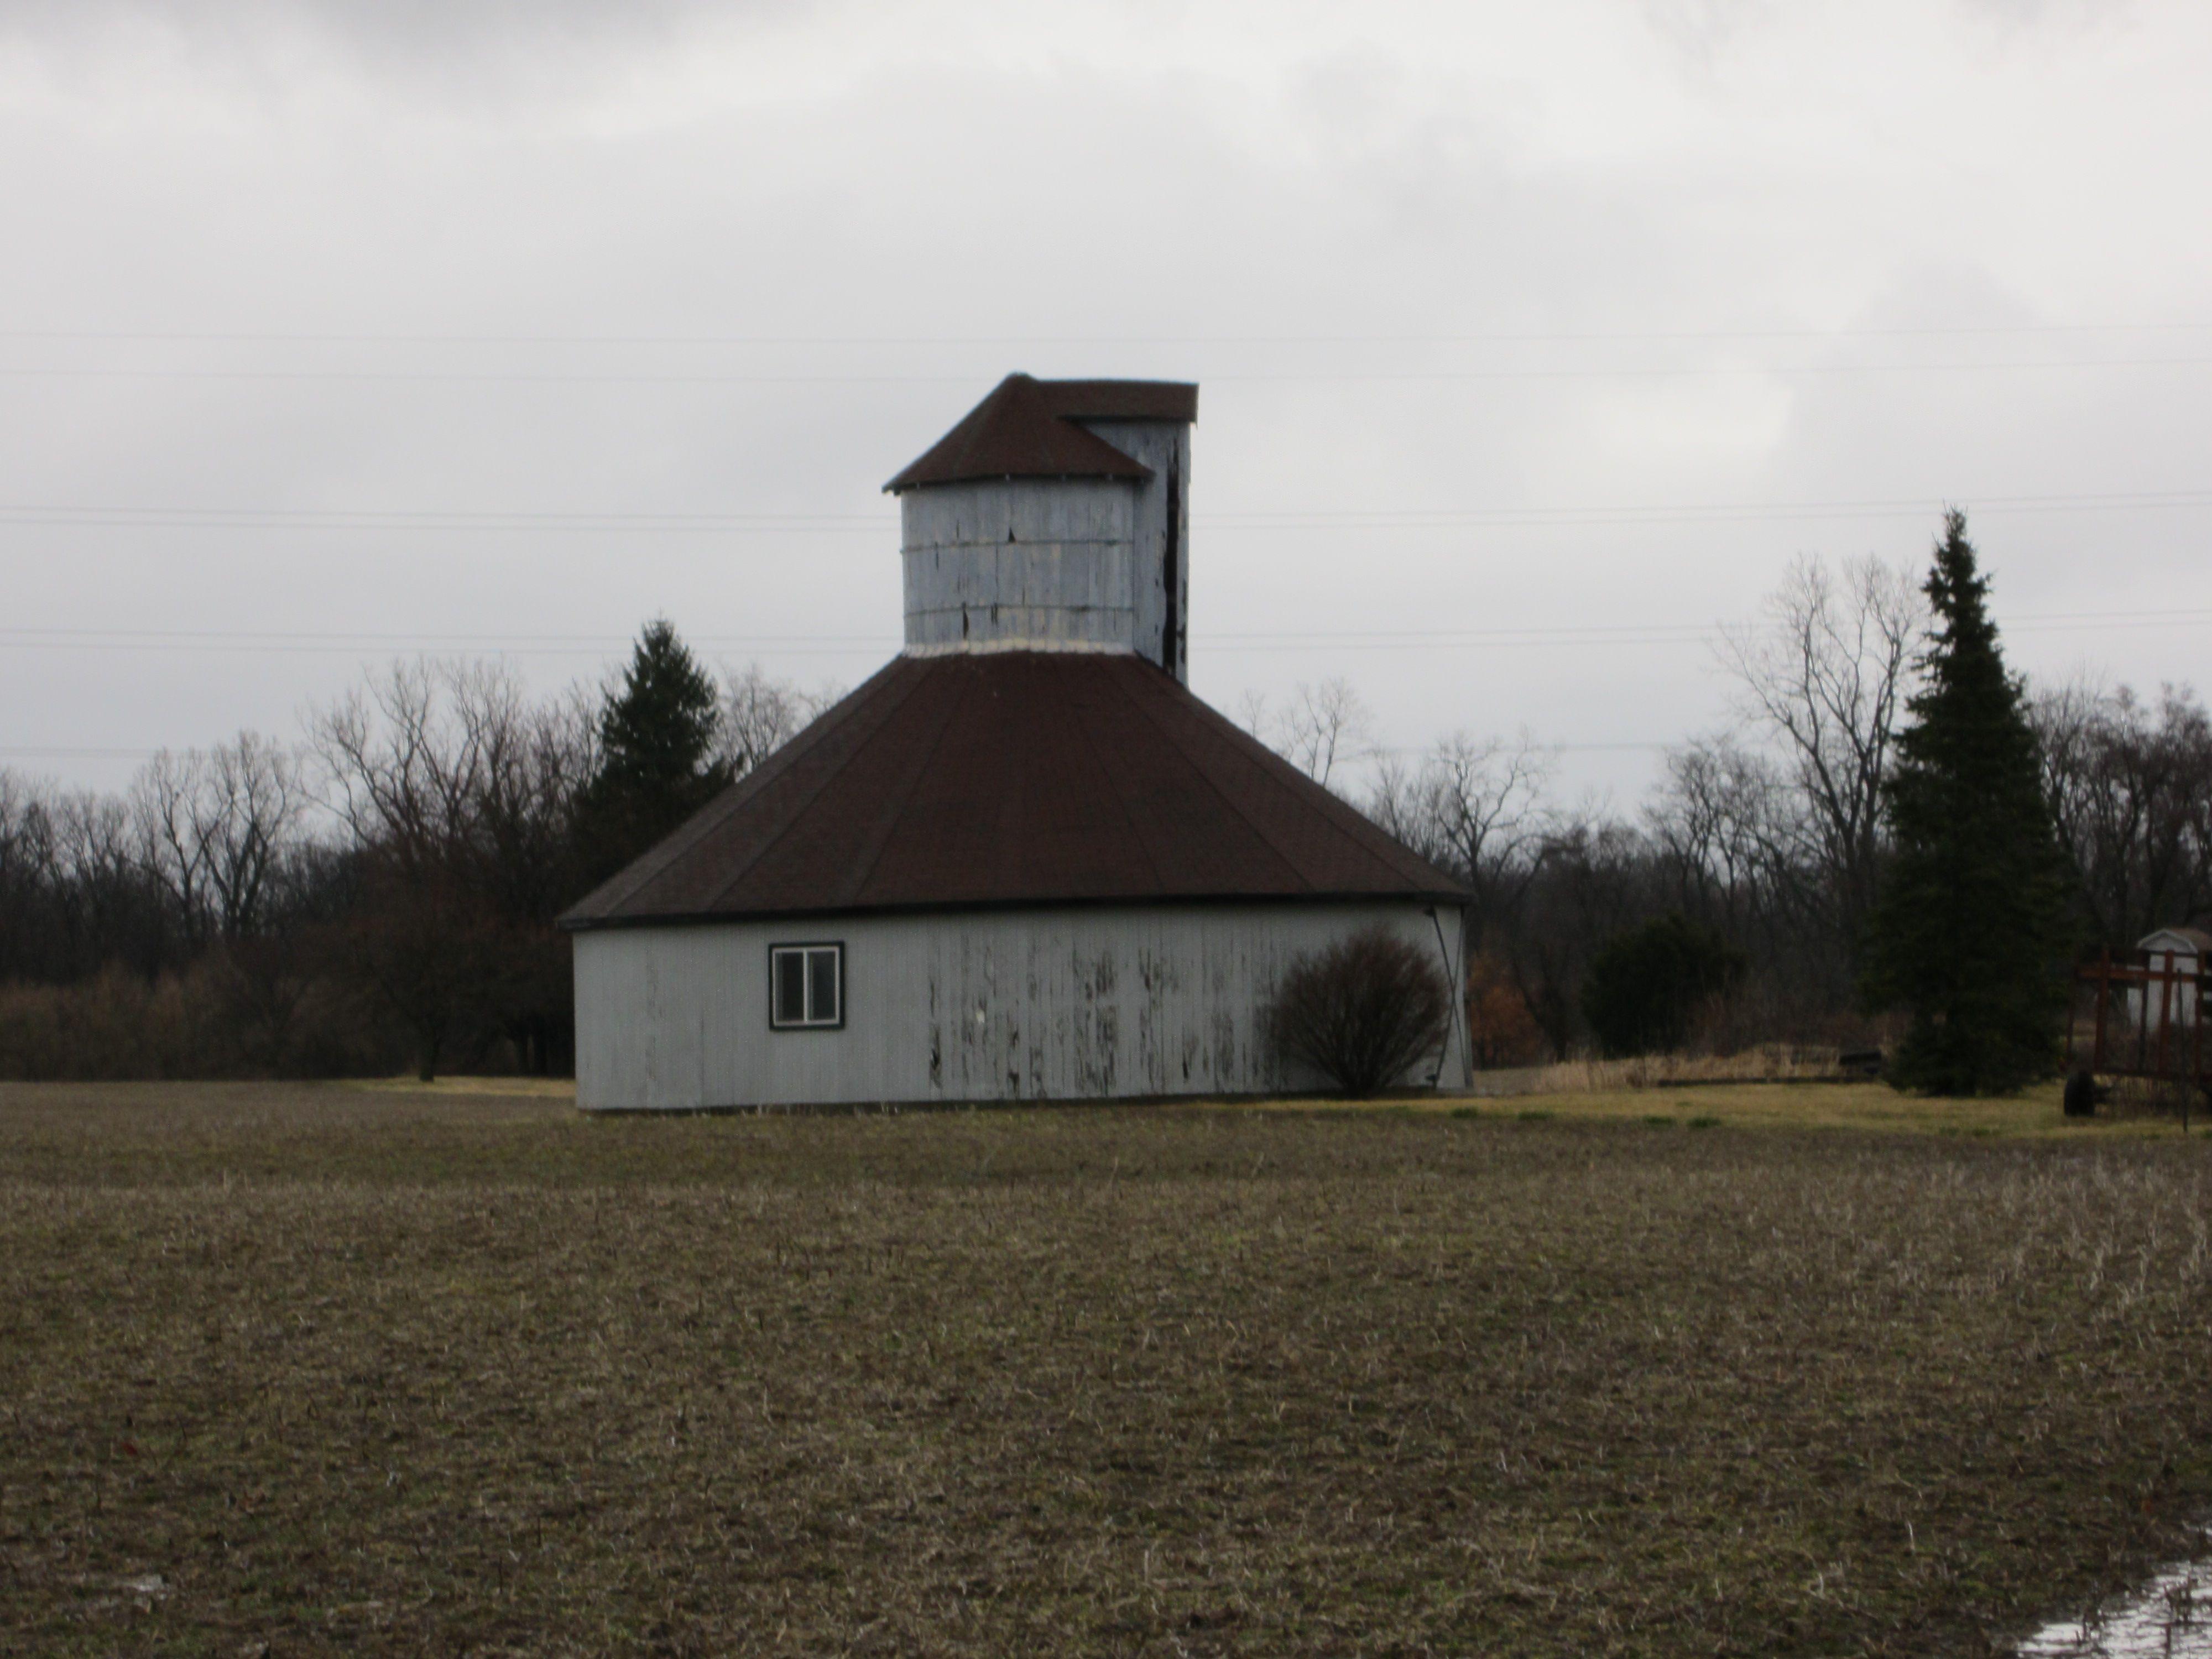 Round Barn Randolph County, Indiana Barn cupola, Farm